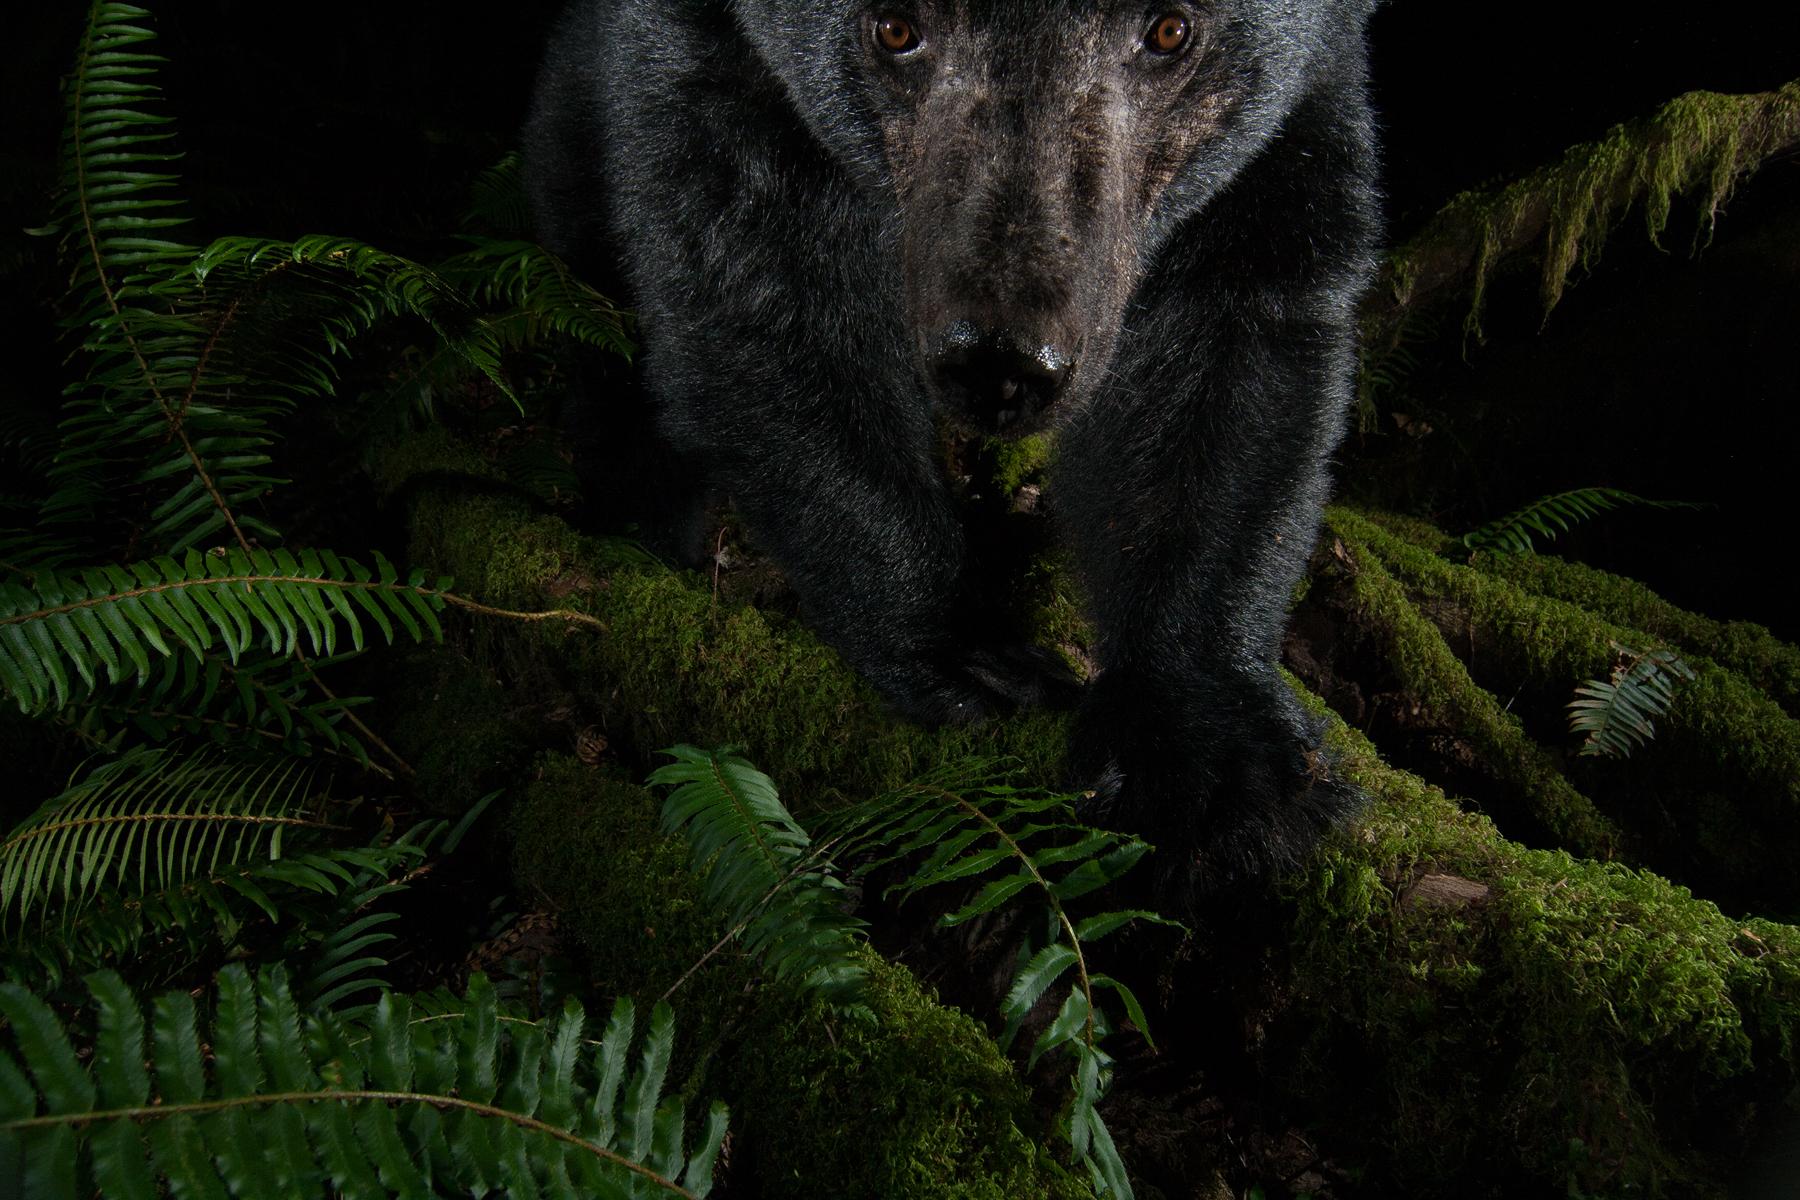 A Black Bear inspects my camera trap at night in a coastal temperate rainforest.  Maple Ridge, British Columbia, Canada.  Image ©Connor Stefanison